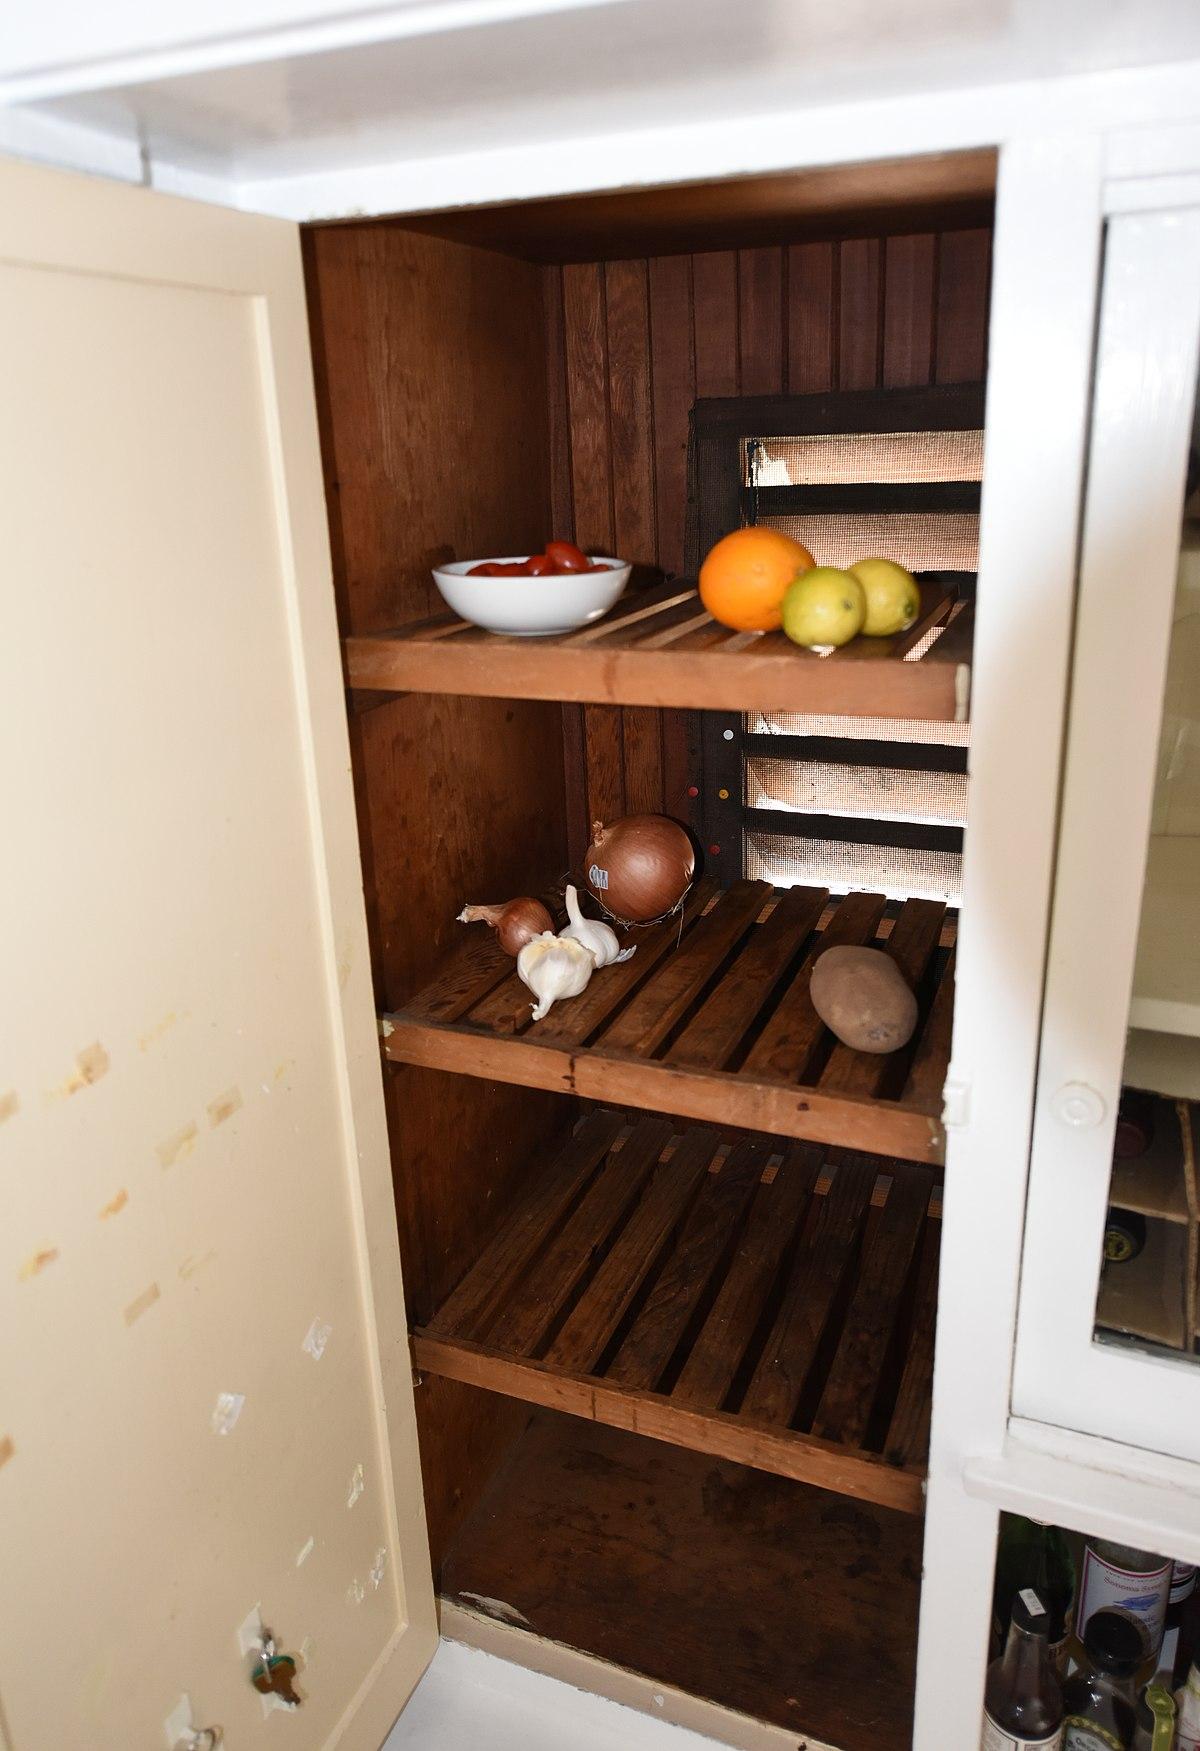 California Cooler (cabinet) - Wikipedia